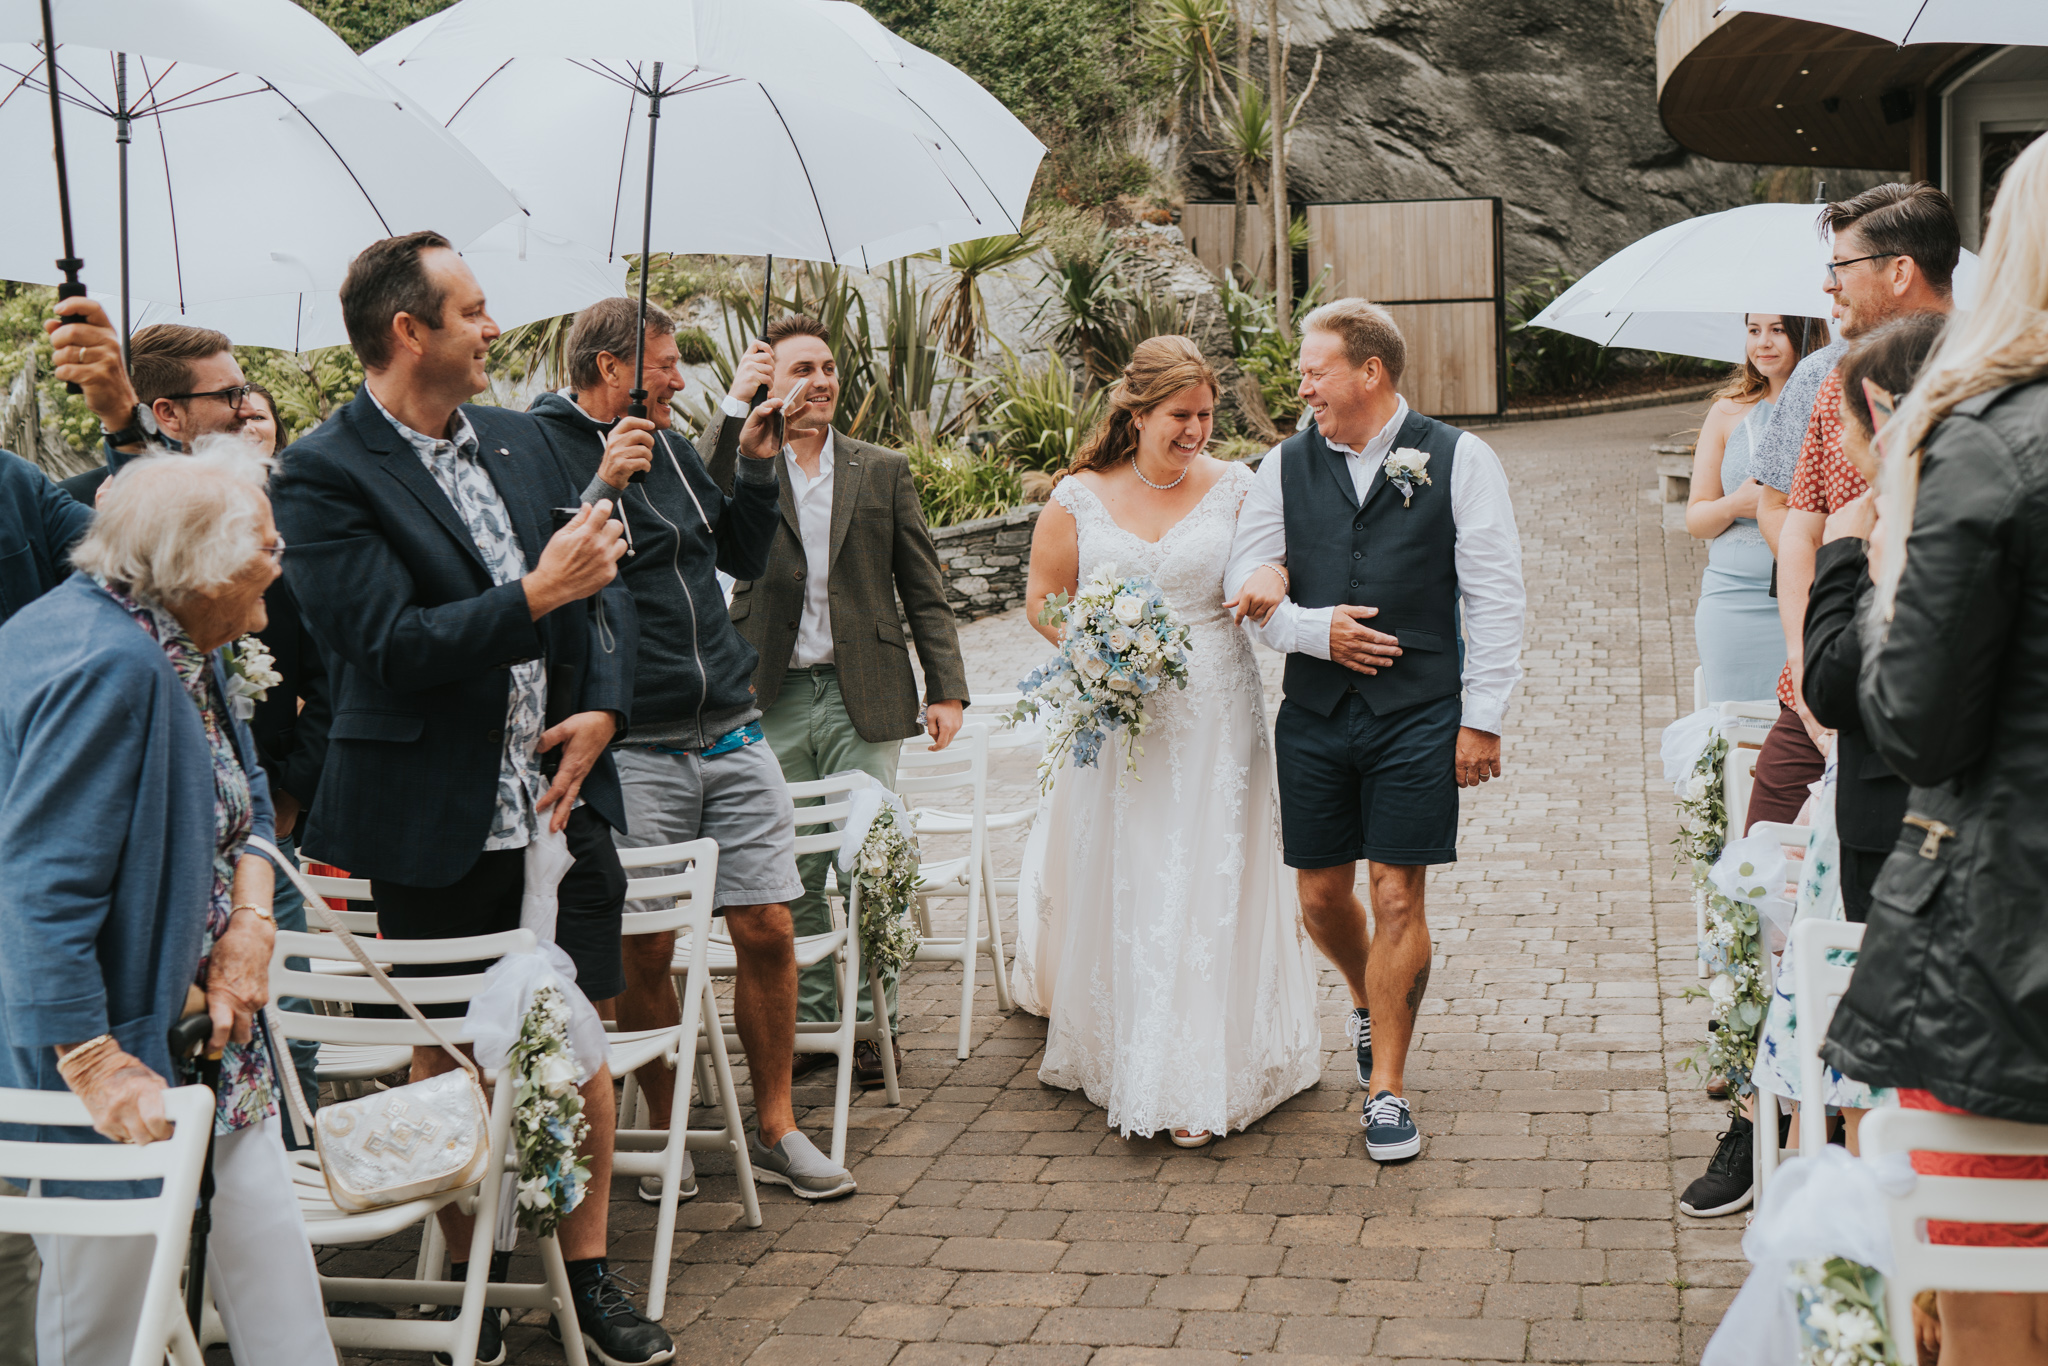 john-amy-relaxed-beach-wedding-tunnels-beaches-ilfracombe-north-devon-grace-elizabeth-colchester-essex-alternative-relaxed-wedding-photography-devon-suffolk-norfolk-essex (50 of 159).jpg